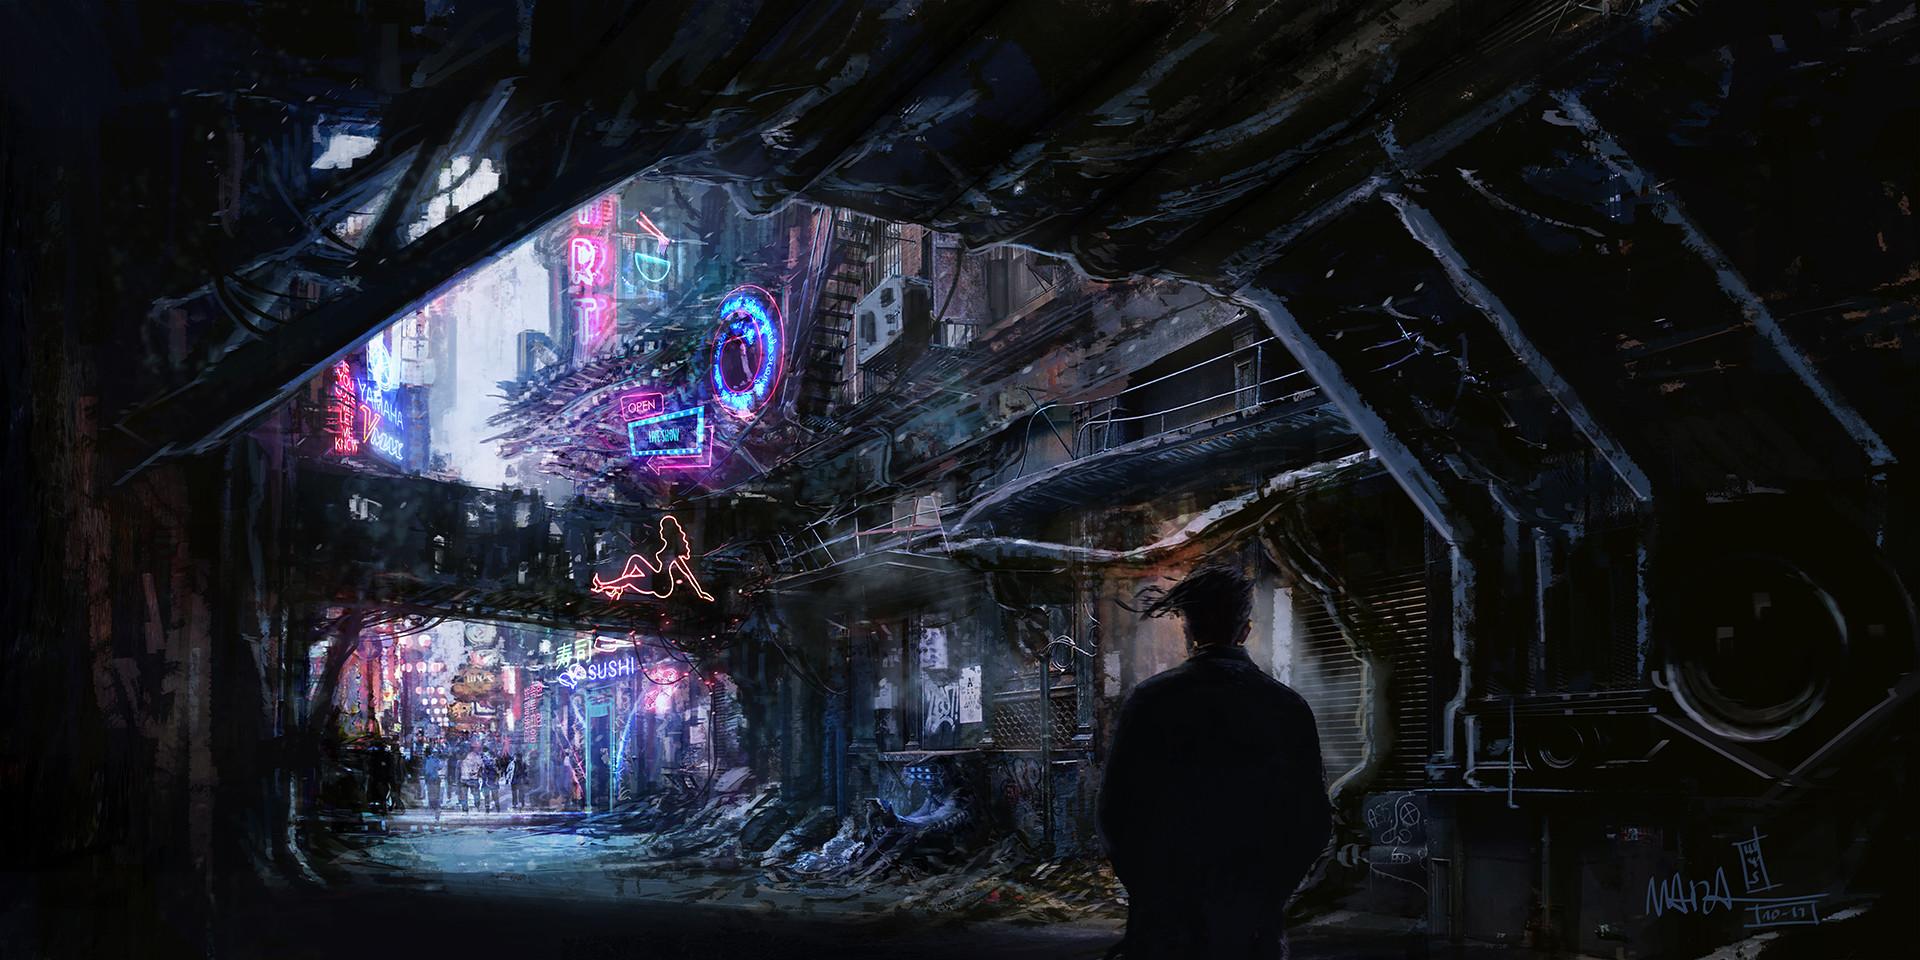 Ghost in the Machine (IC) Dario-marzadori-cyber-alley-hd